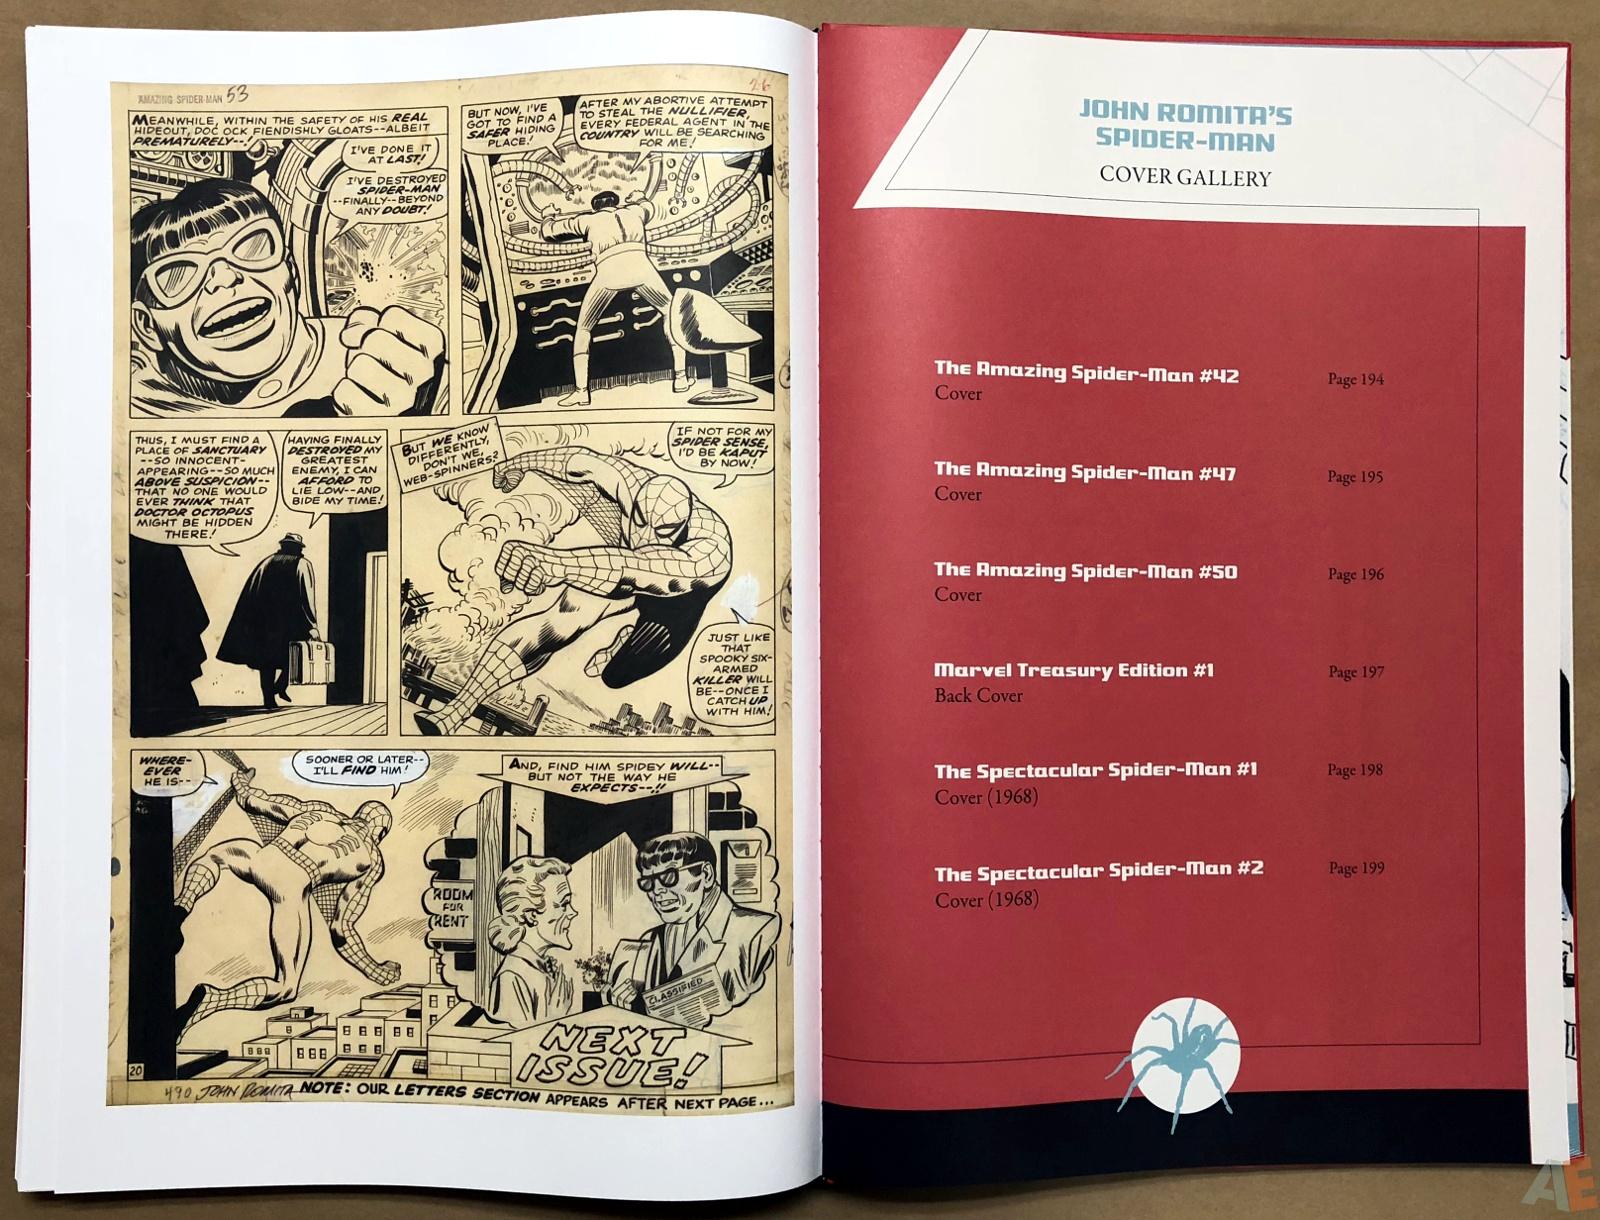 John Romita's The Amazing Spider-Man Artifact Edition